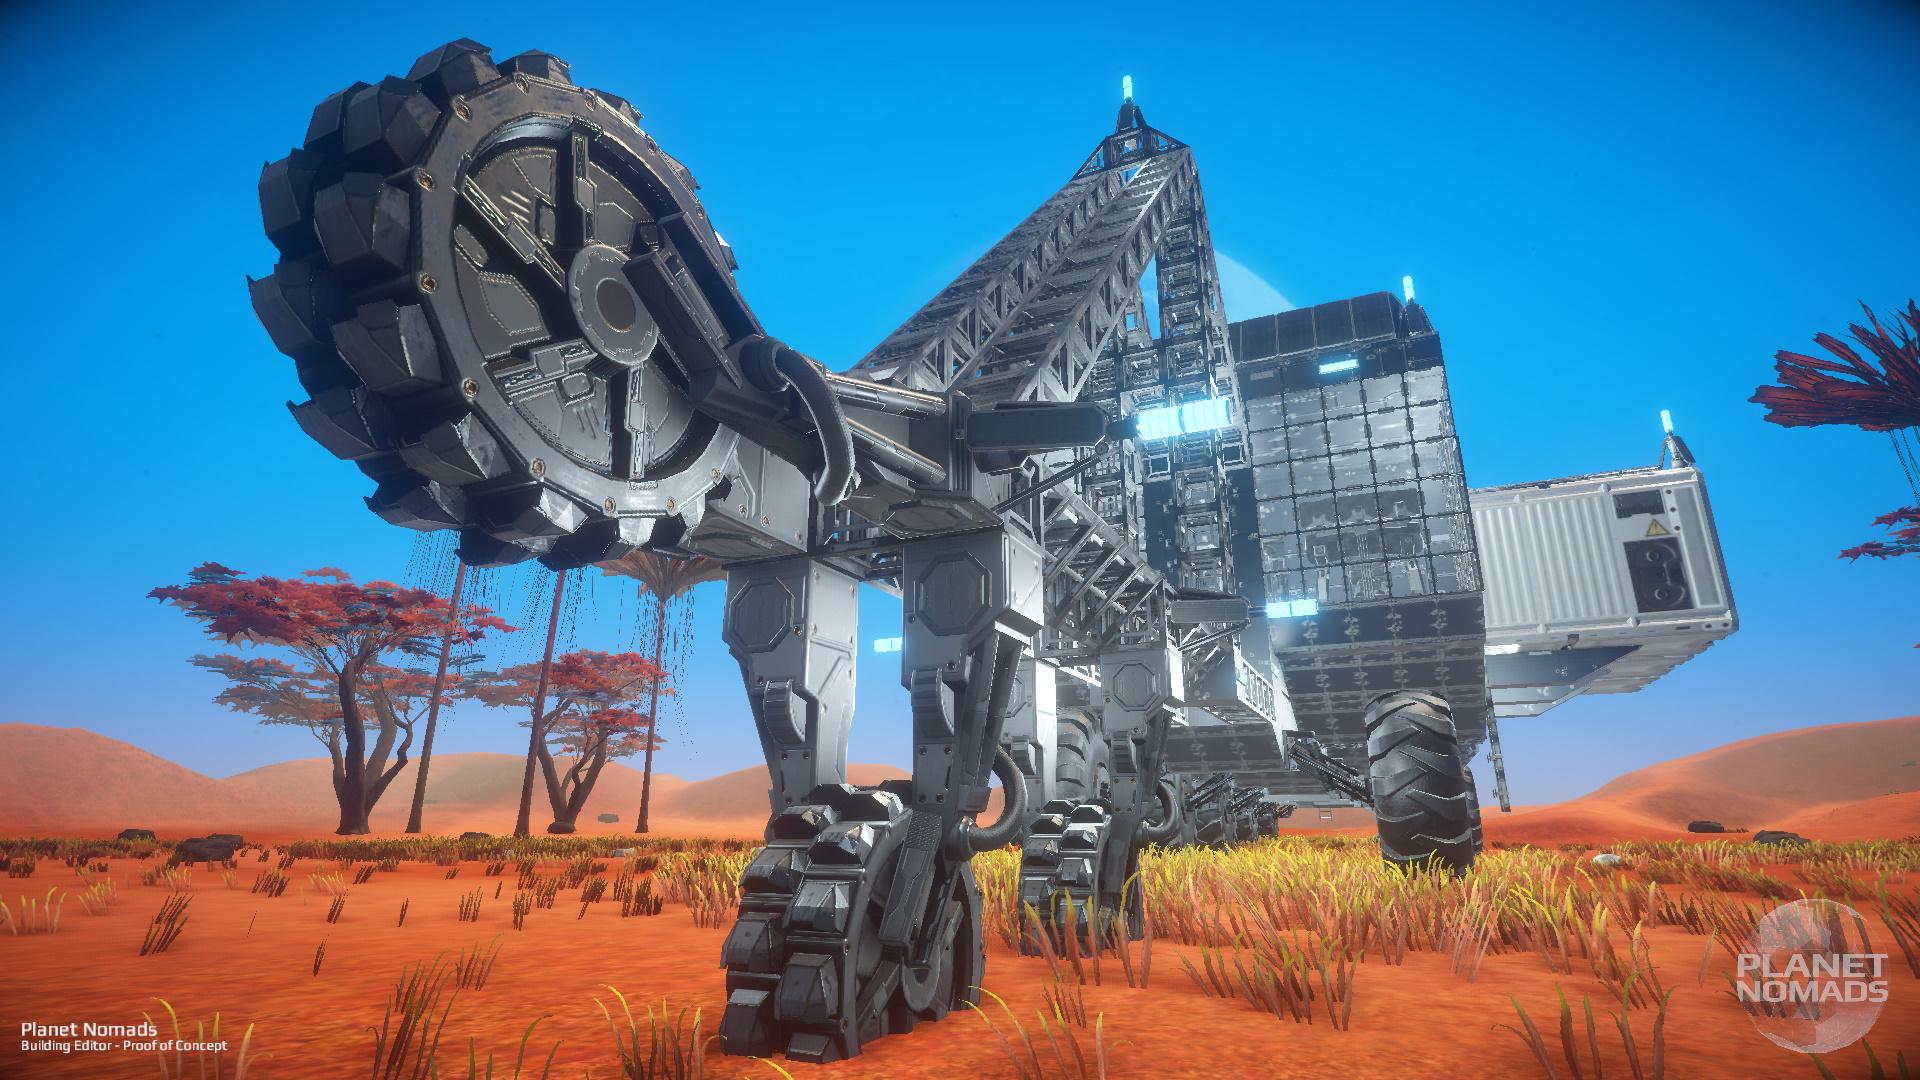 Planet Nomads – Mining Machine